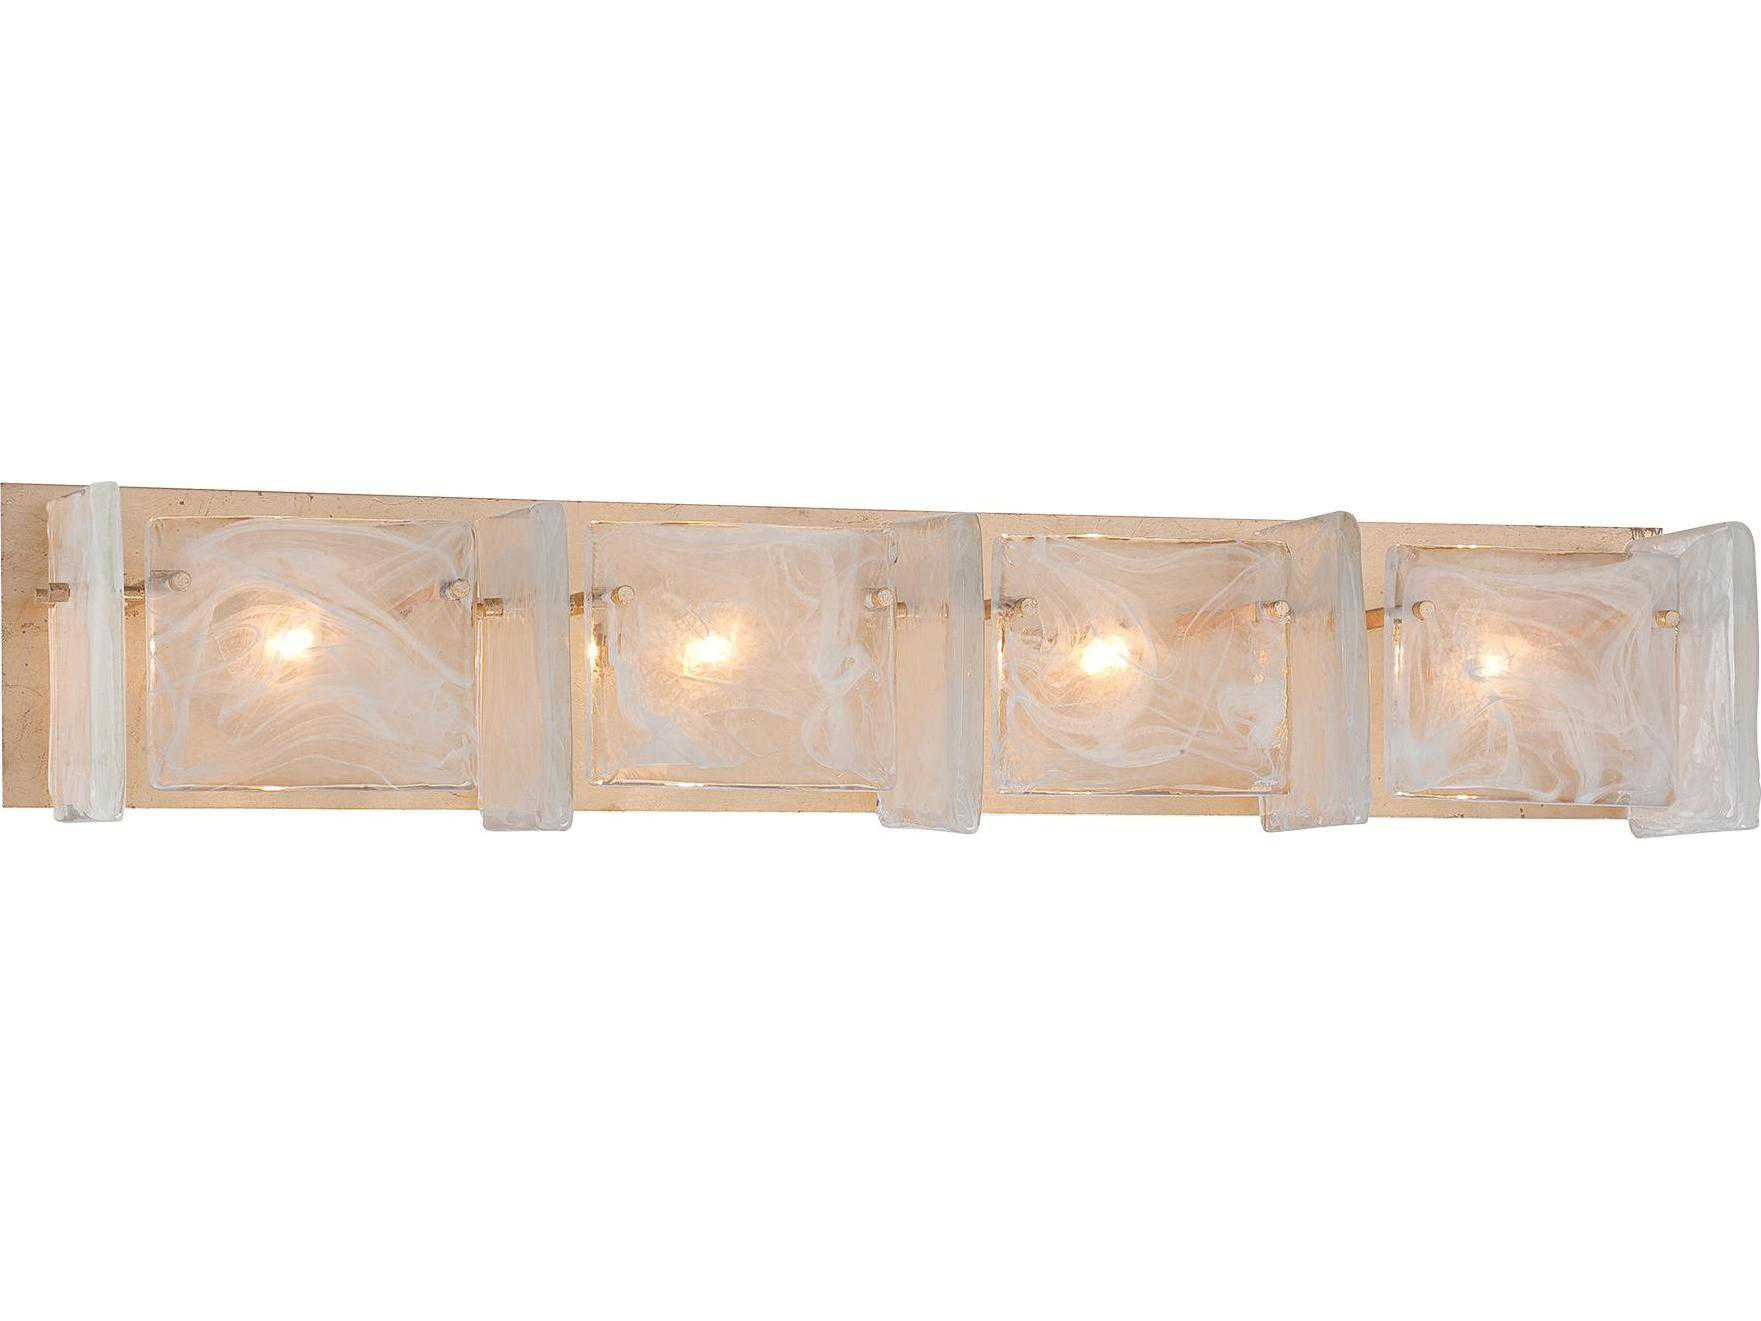 Metropolitan Lighting Arctic Frost Antique French Gold Four-Lights Vanity Light METN1784595